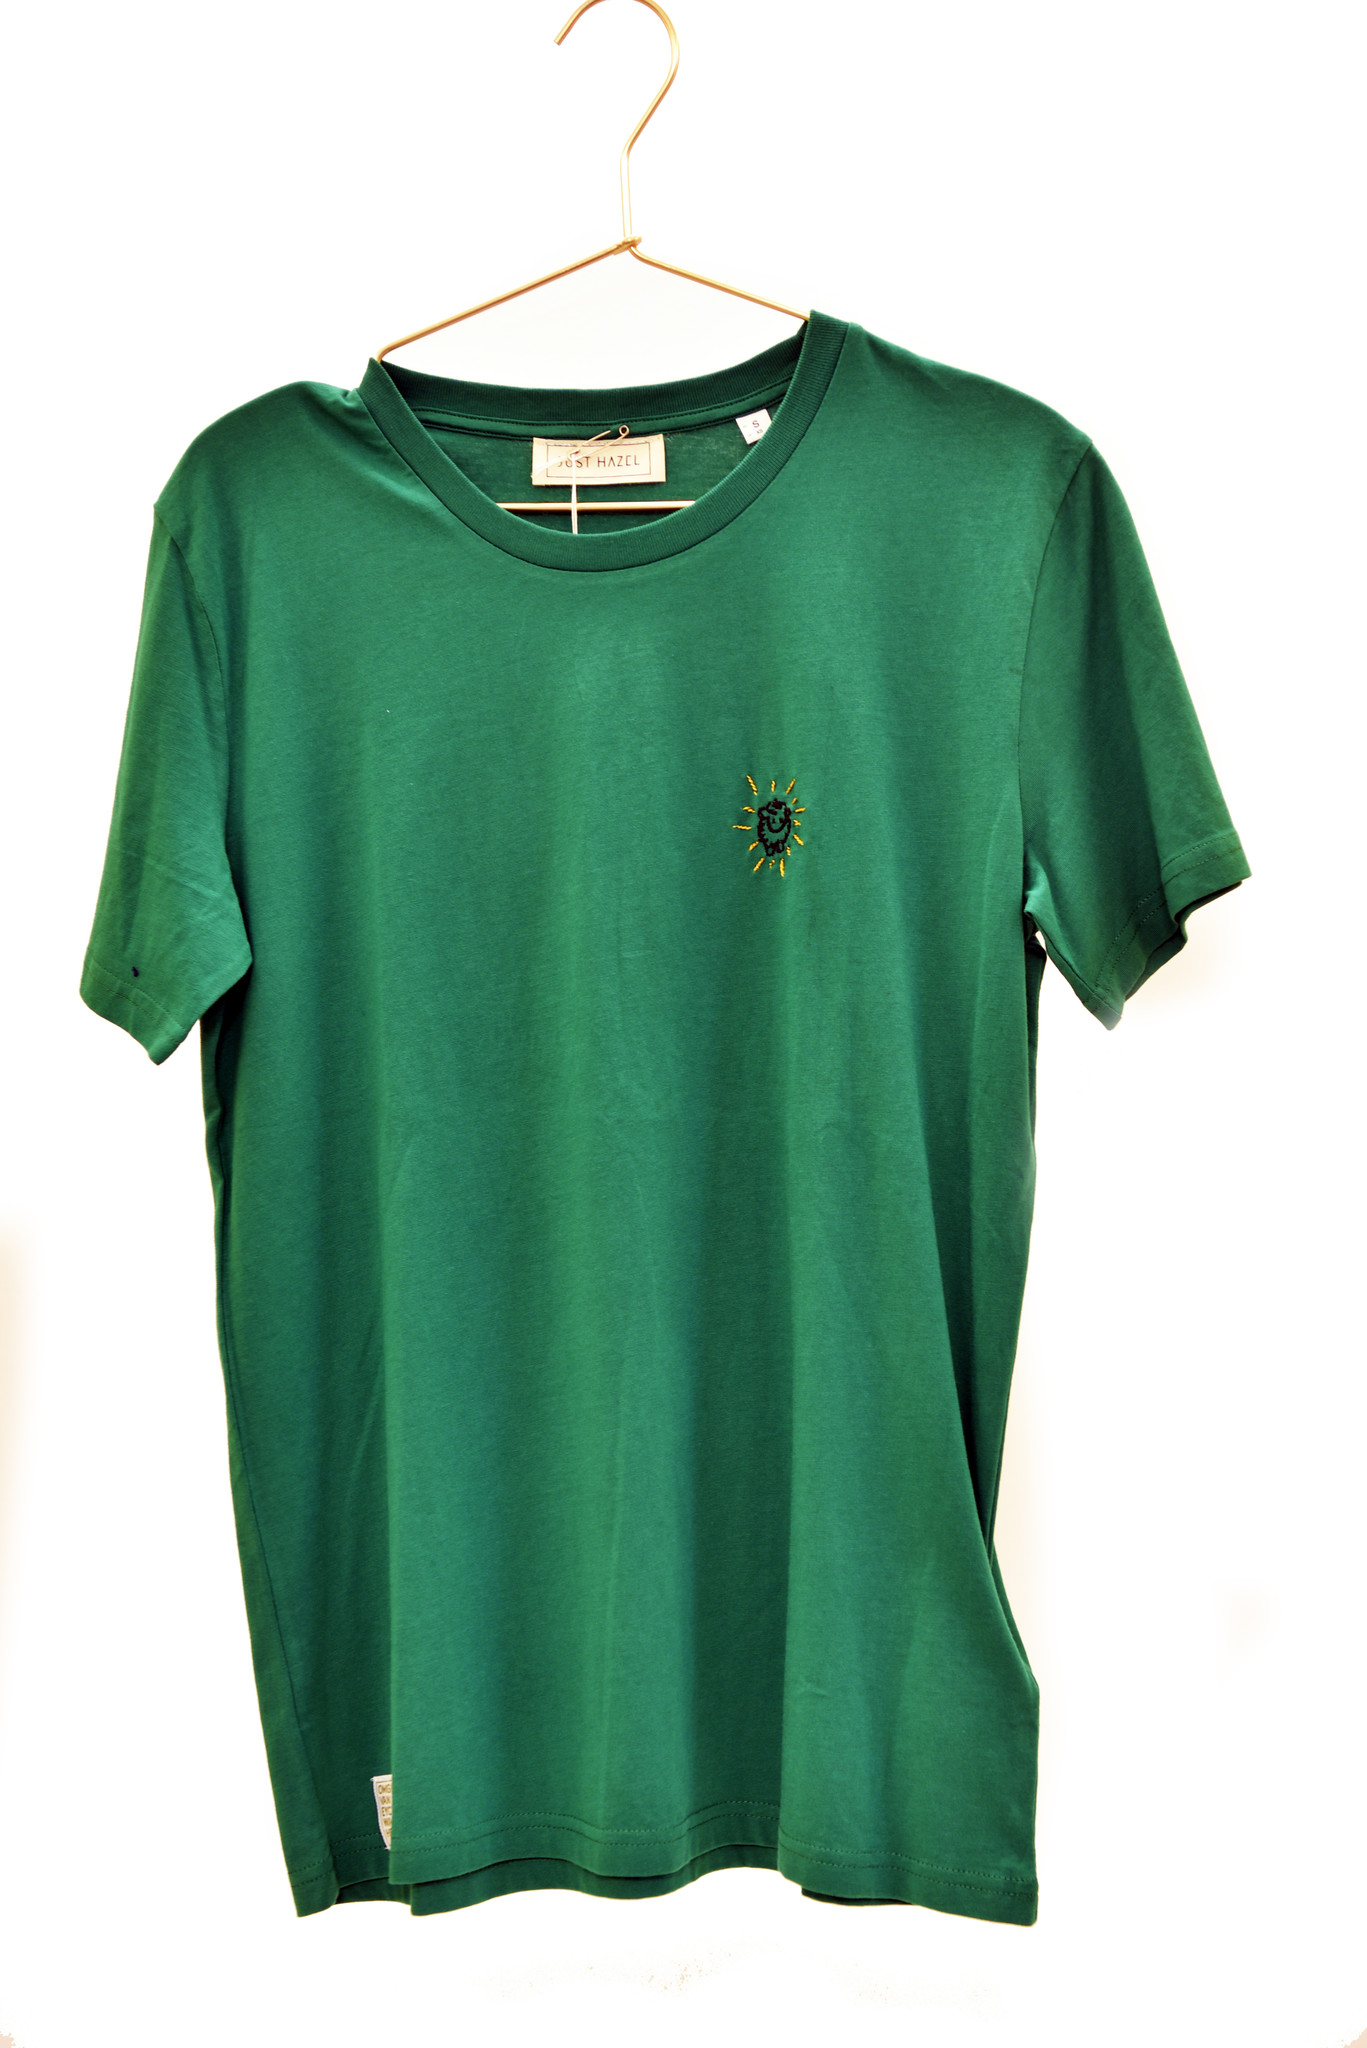 Just Hazel T-shirt Lam groen - Just Hazel